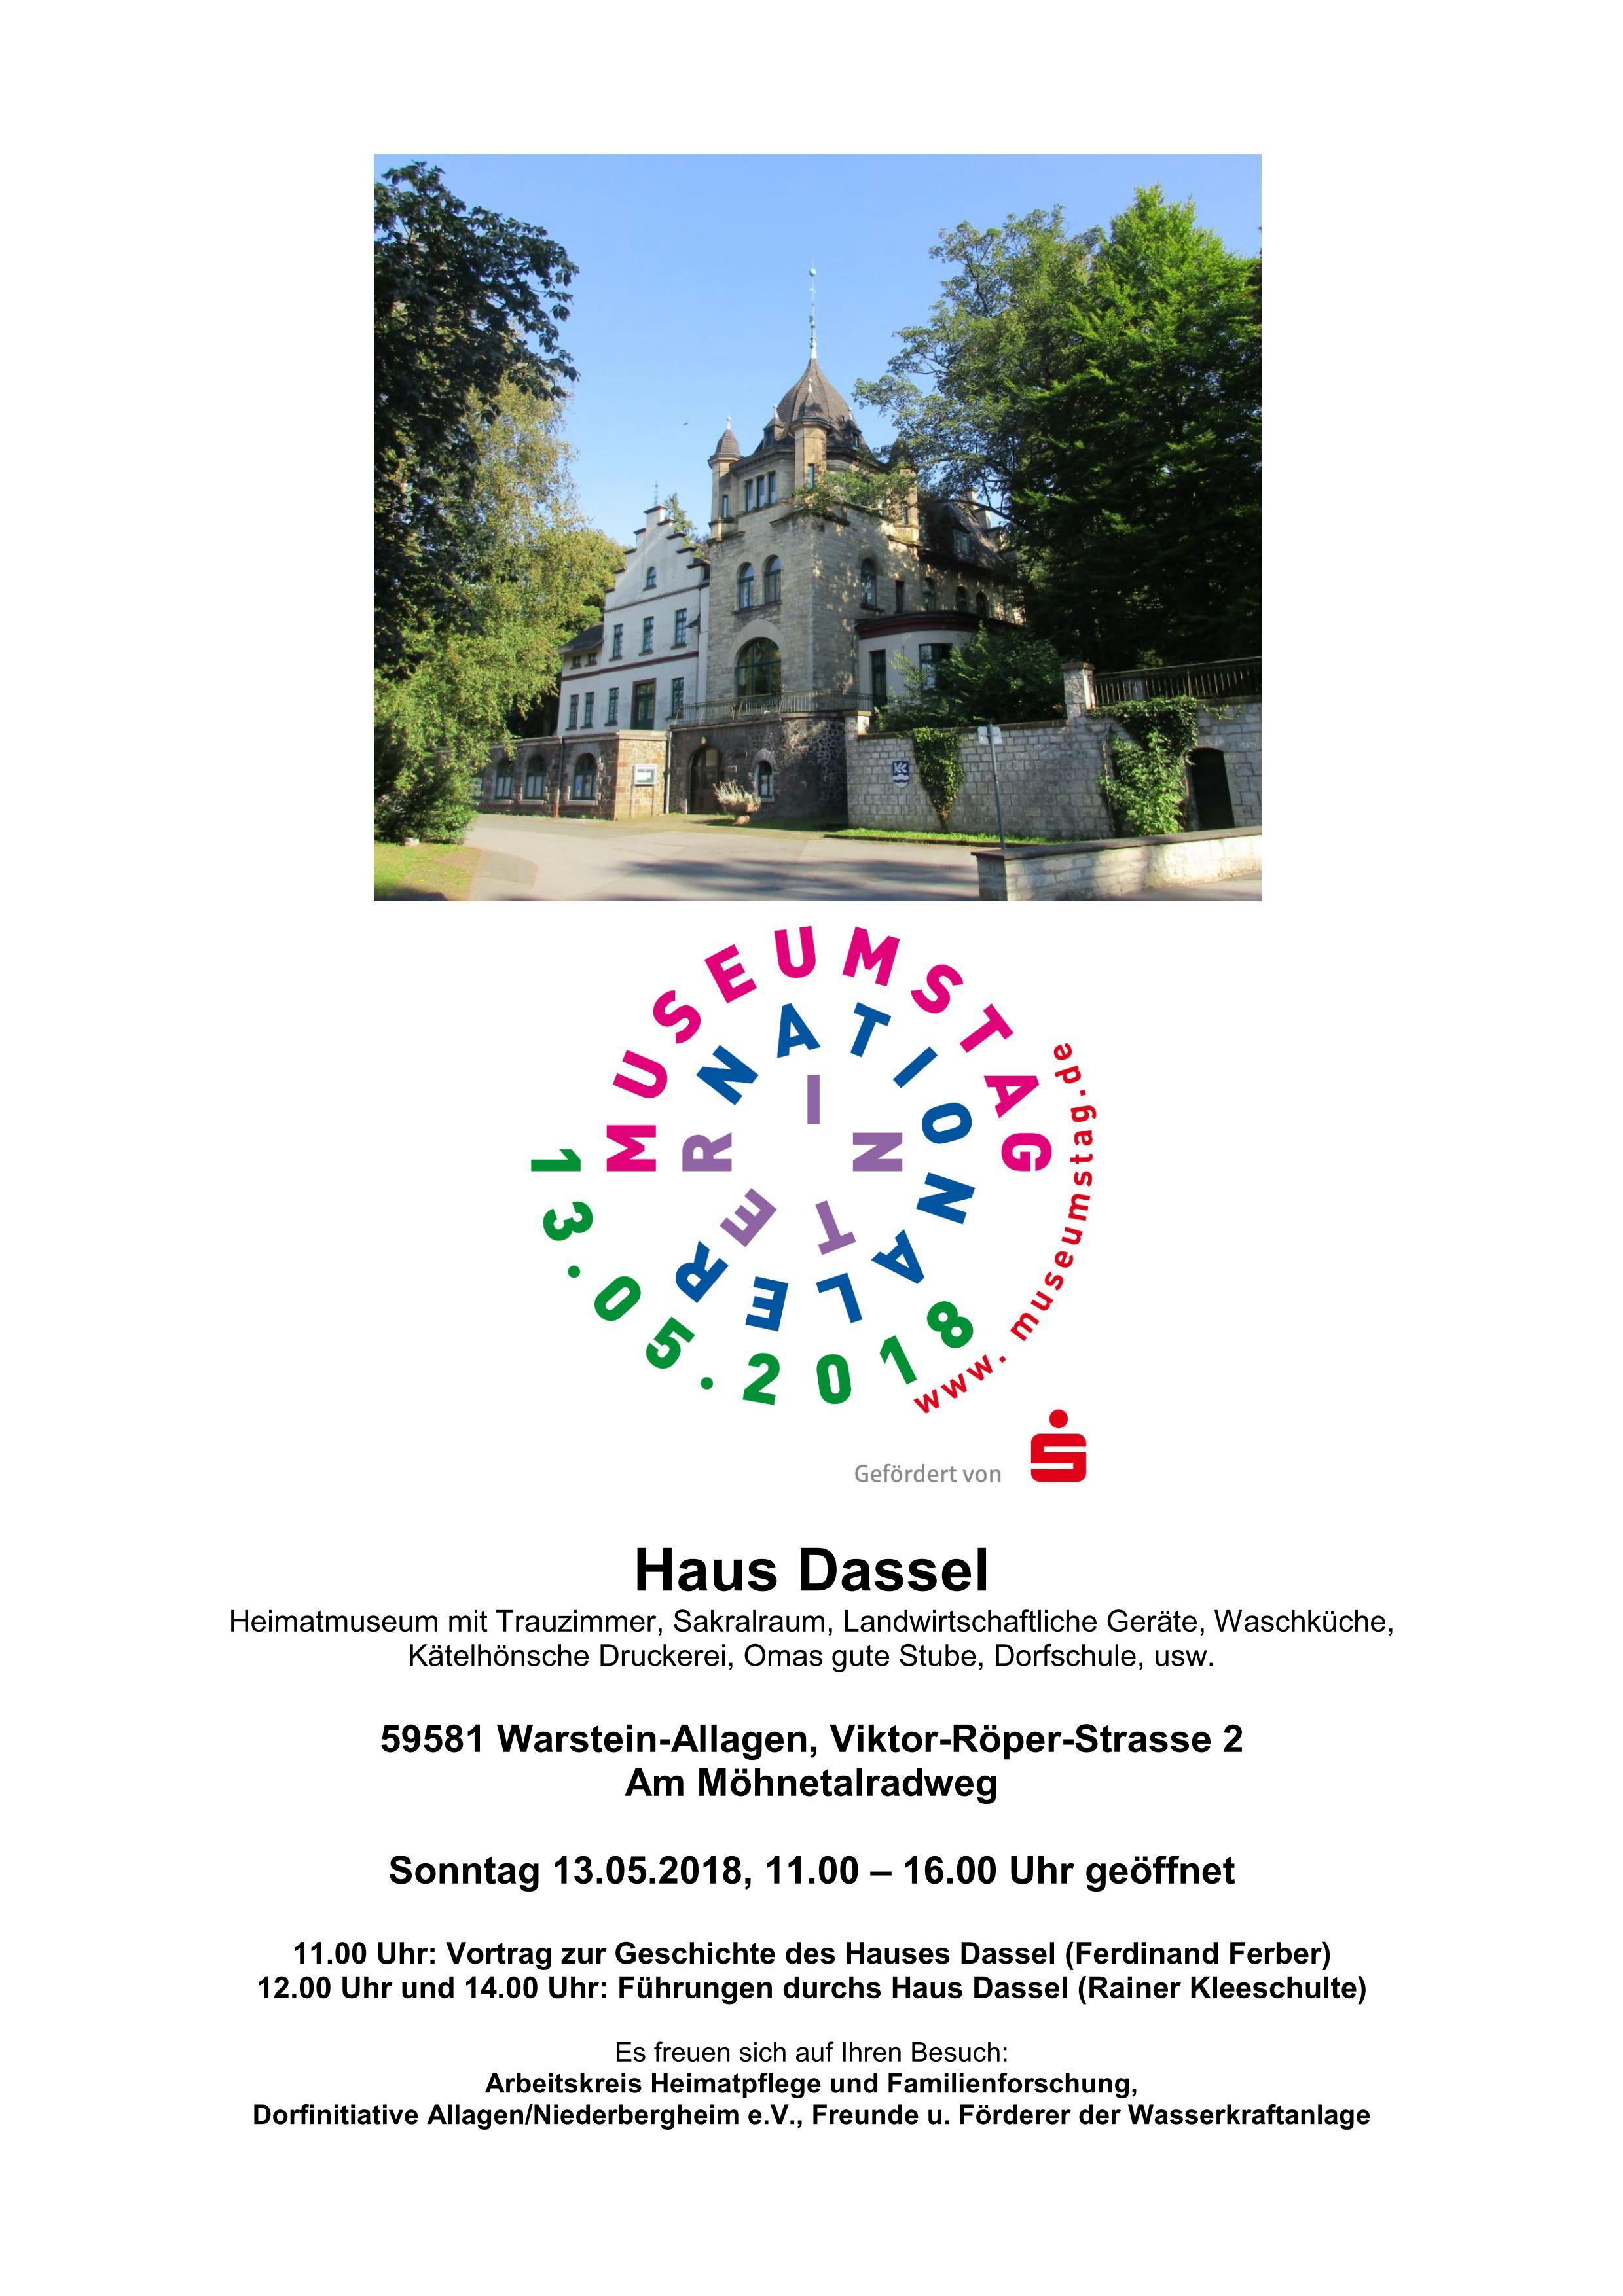 Plakat internationaler Museumstag Haus Dassel